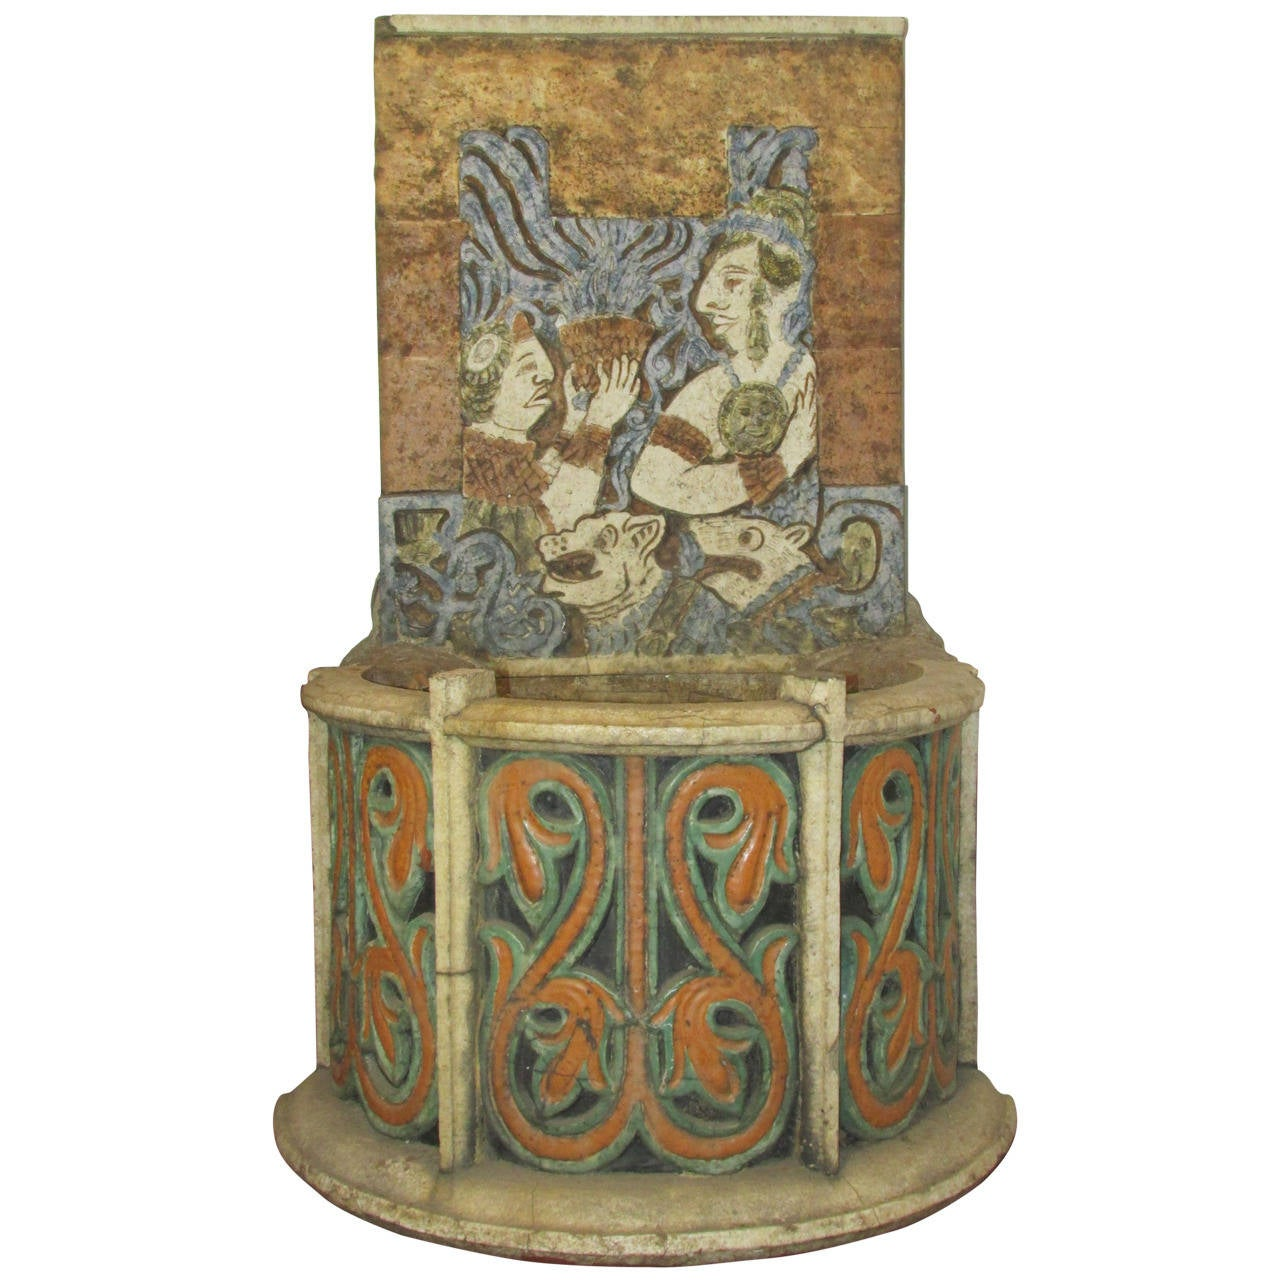 Rare Antique Terracotta Tile Aztec Mayan Design Fountain